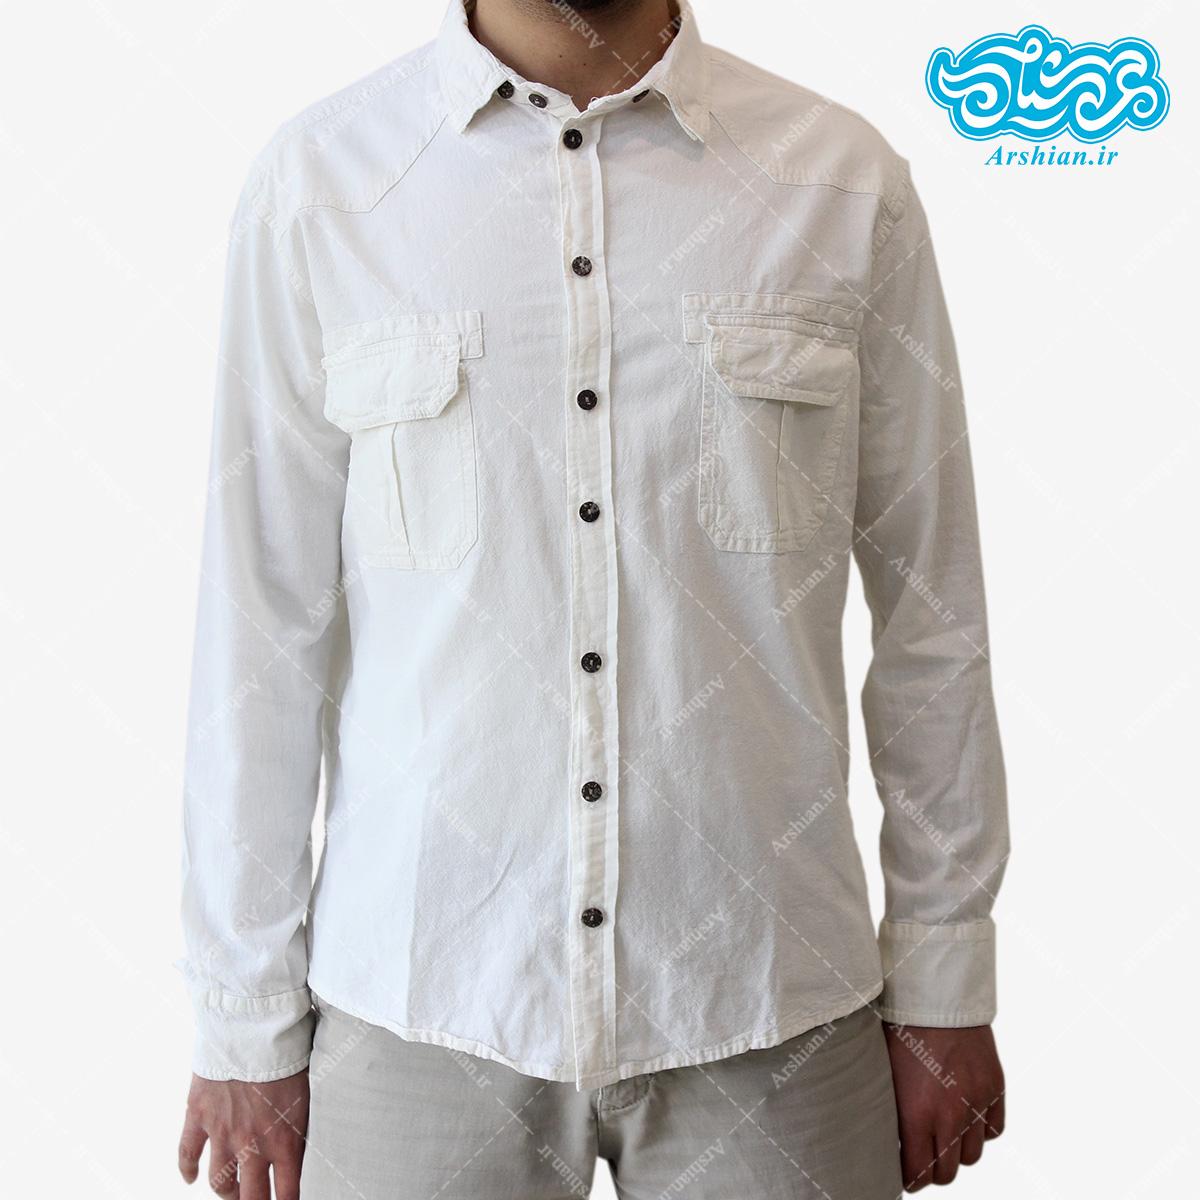 پیراهن الیاف طبیعی طرح دوجیب مدل se001